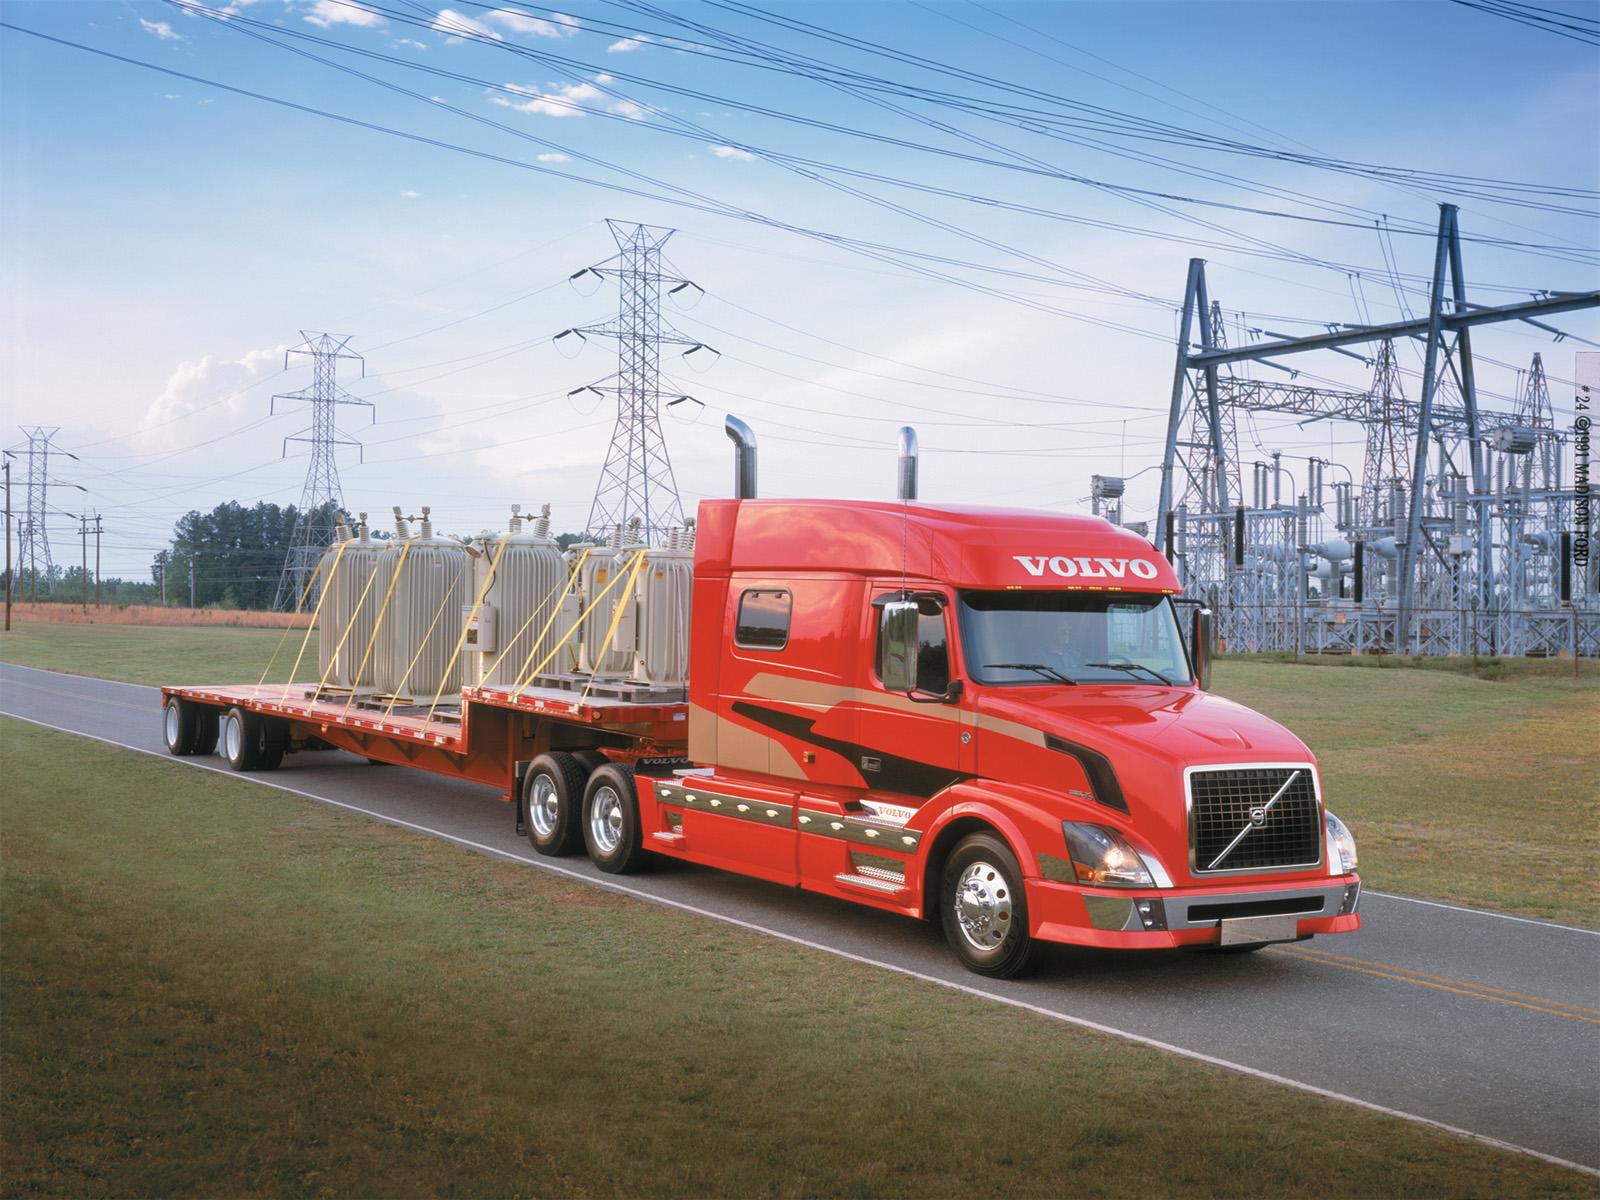 2002 volvo vnl 730 semi tractor wallpaper 1600x1200 130814 wallpaperup - Volvo vnl wallpaper ...